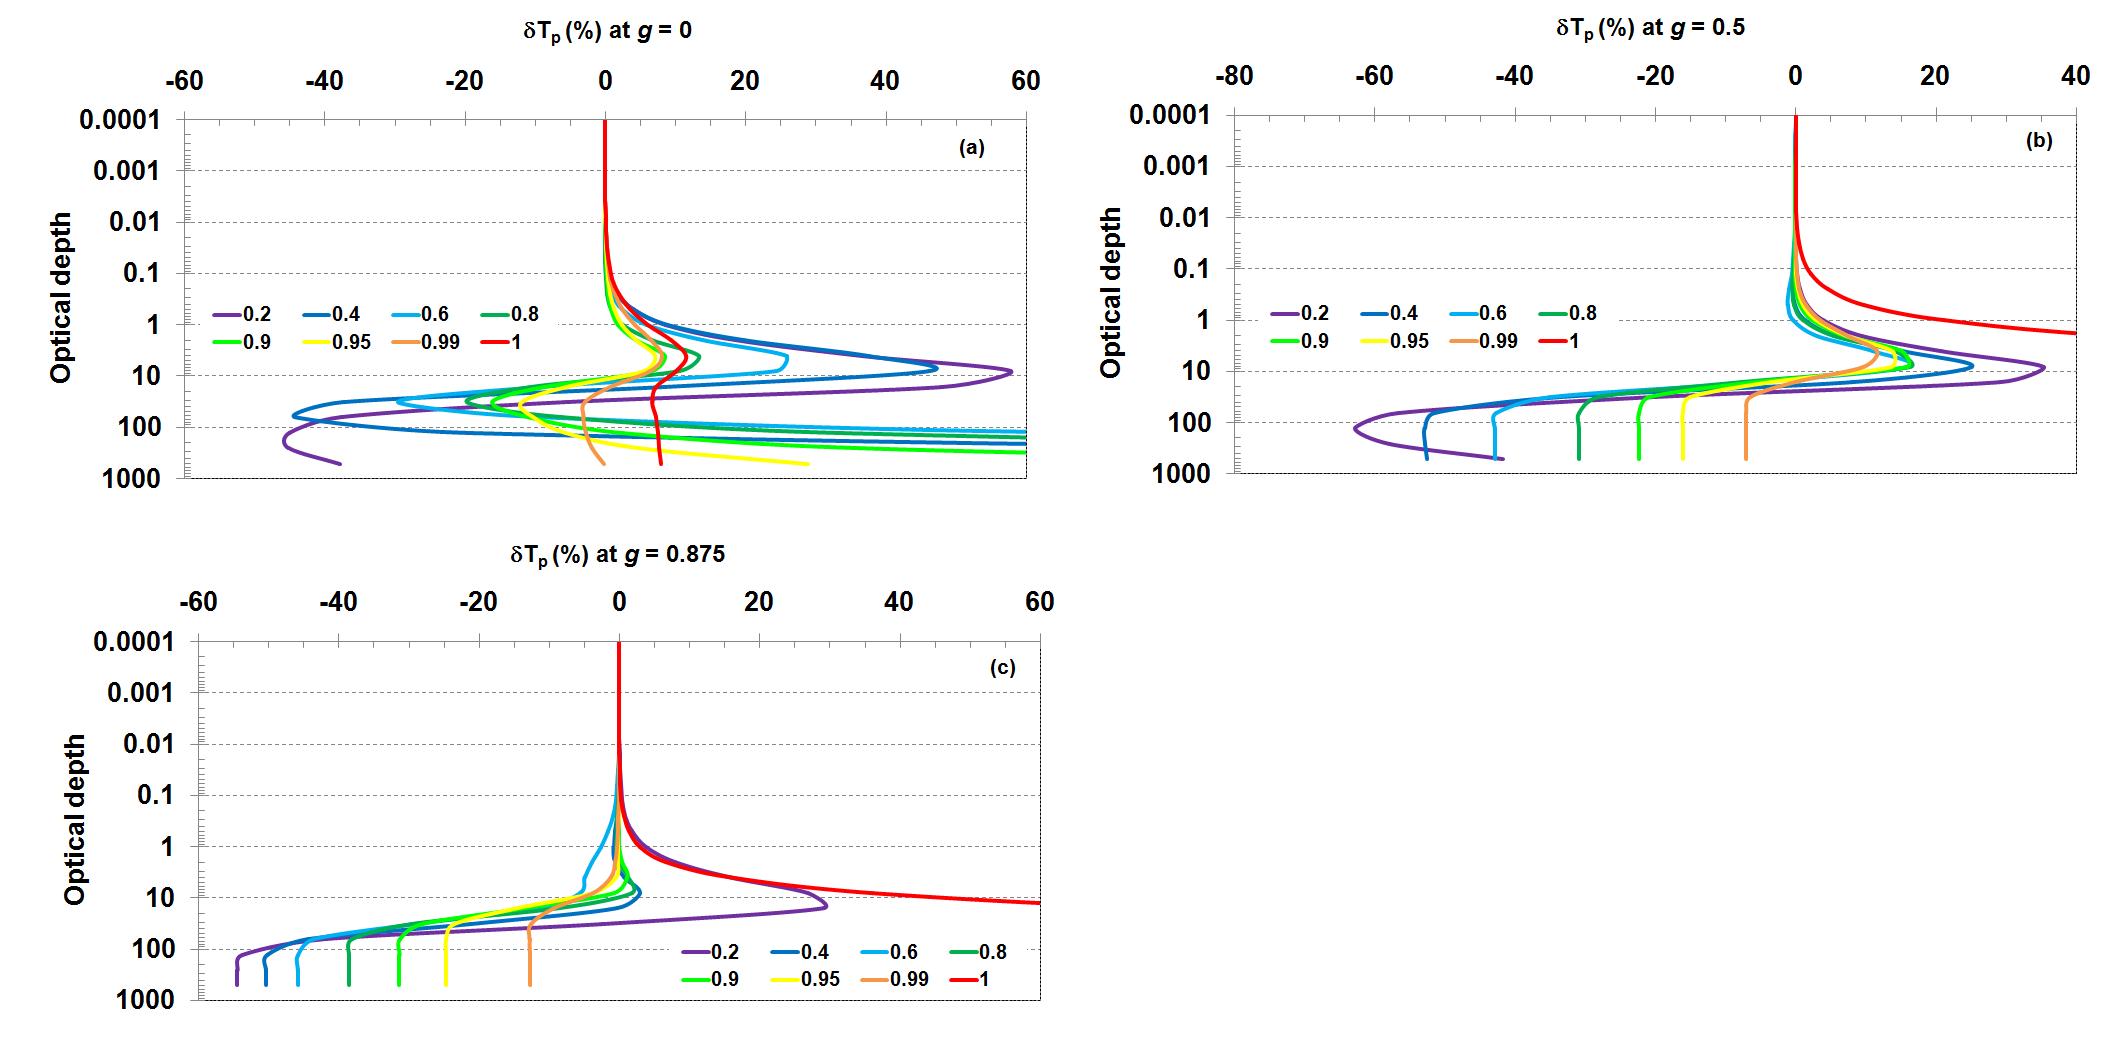 Analytical Approaches To Model Light Transmission Through Turbid Media V1 Preprints